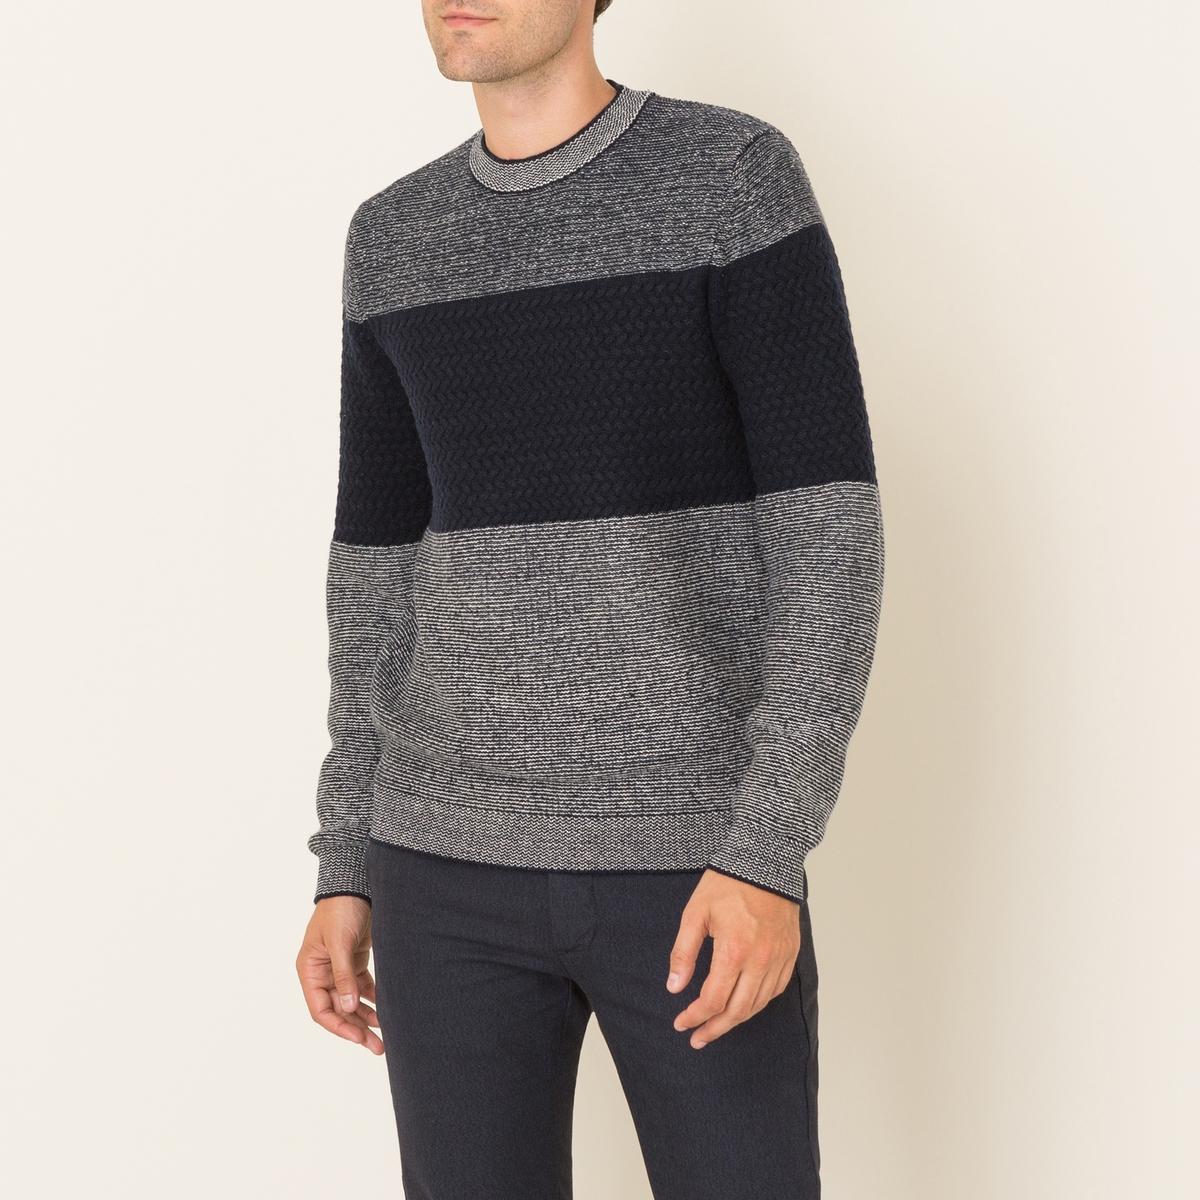 Пуловер SAMPAN от La Redoute